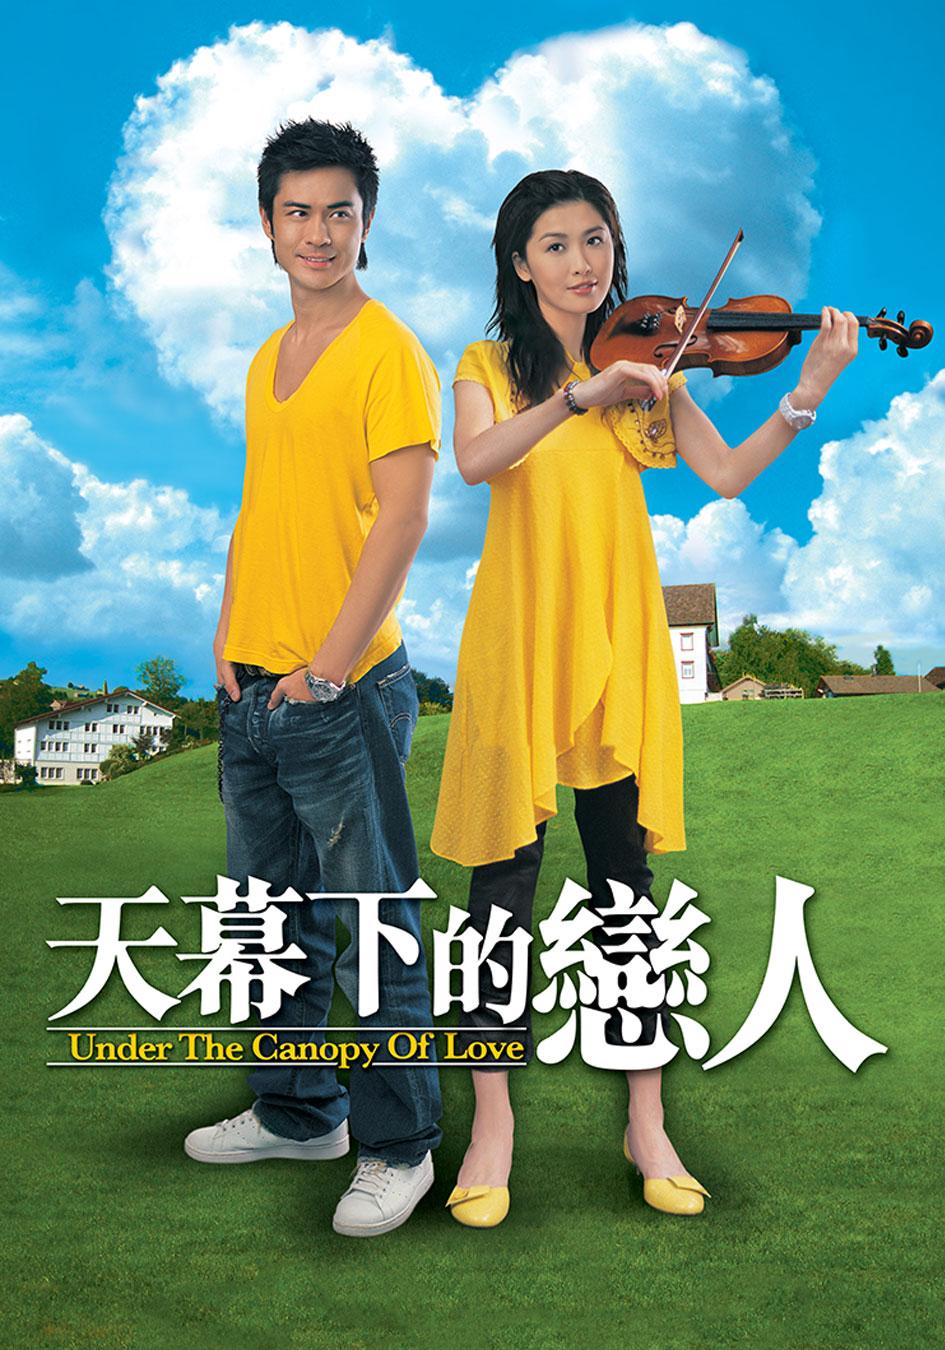 天幕下的戀人 -Under The Canopy Of Love